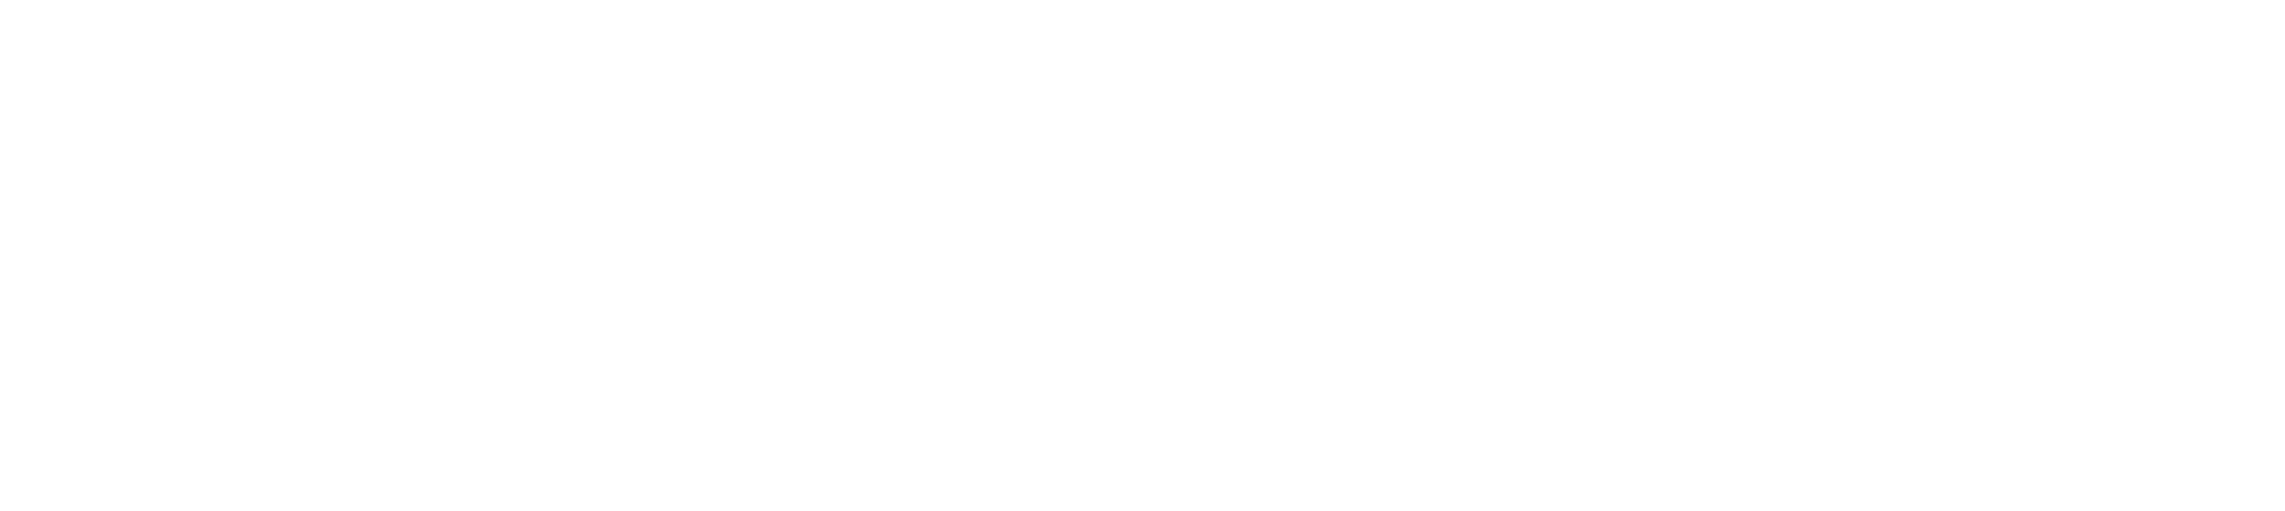 GHD-Horz-2021-REV